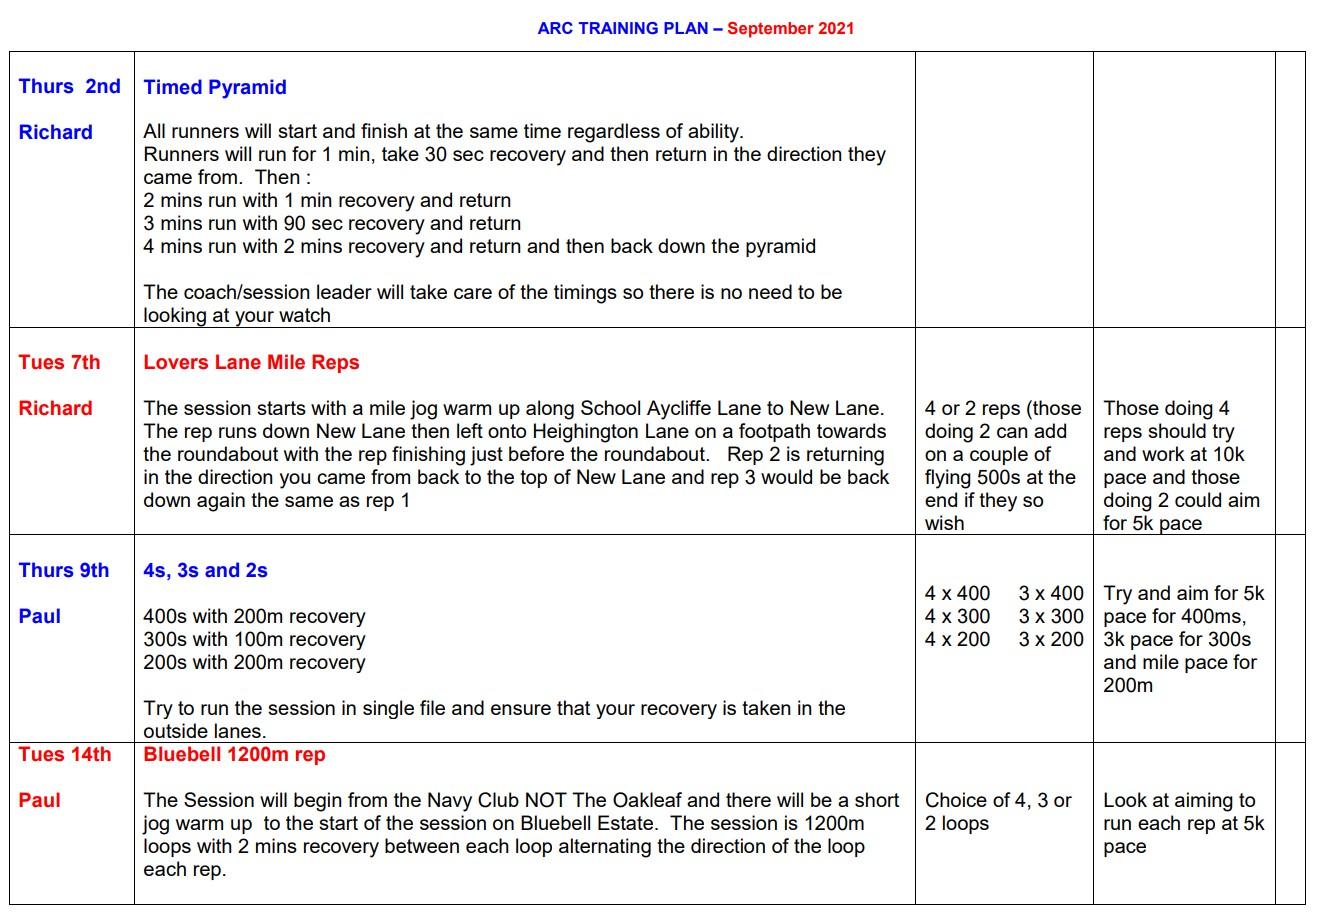 ARC Training Plan September 2021 a